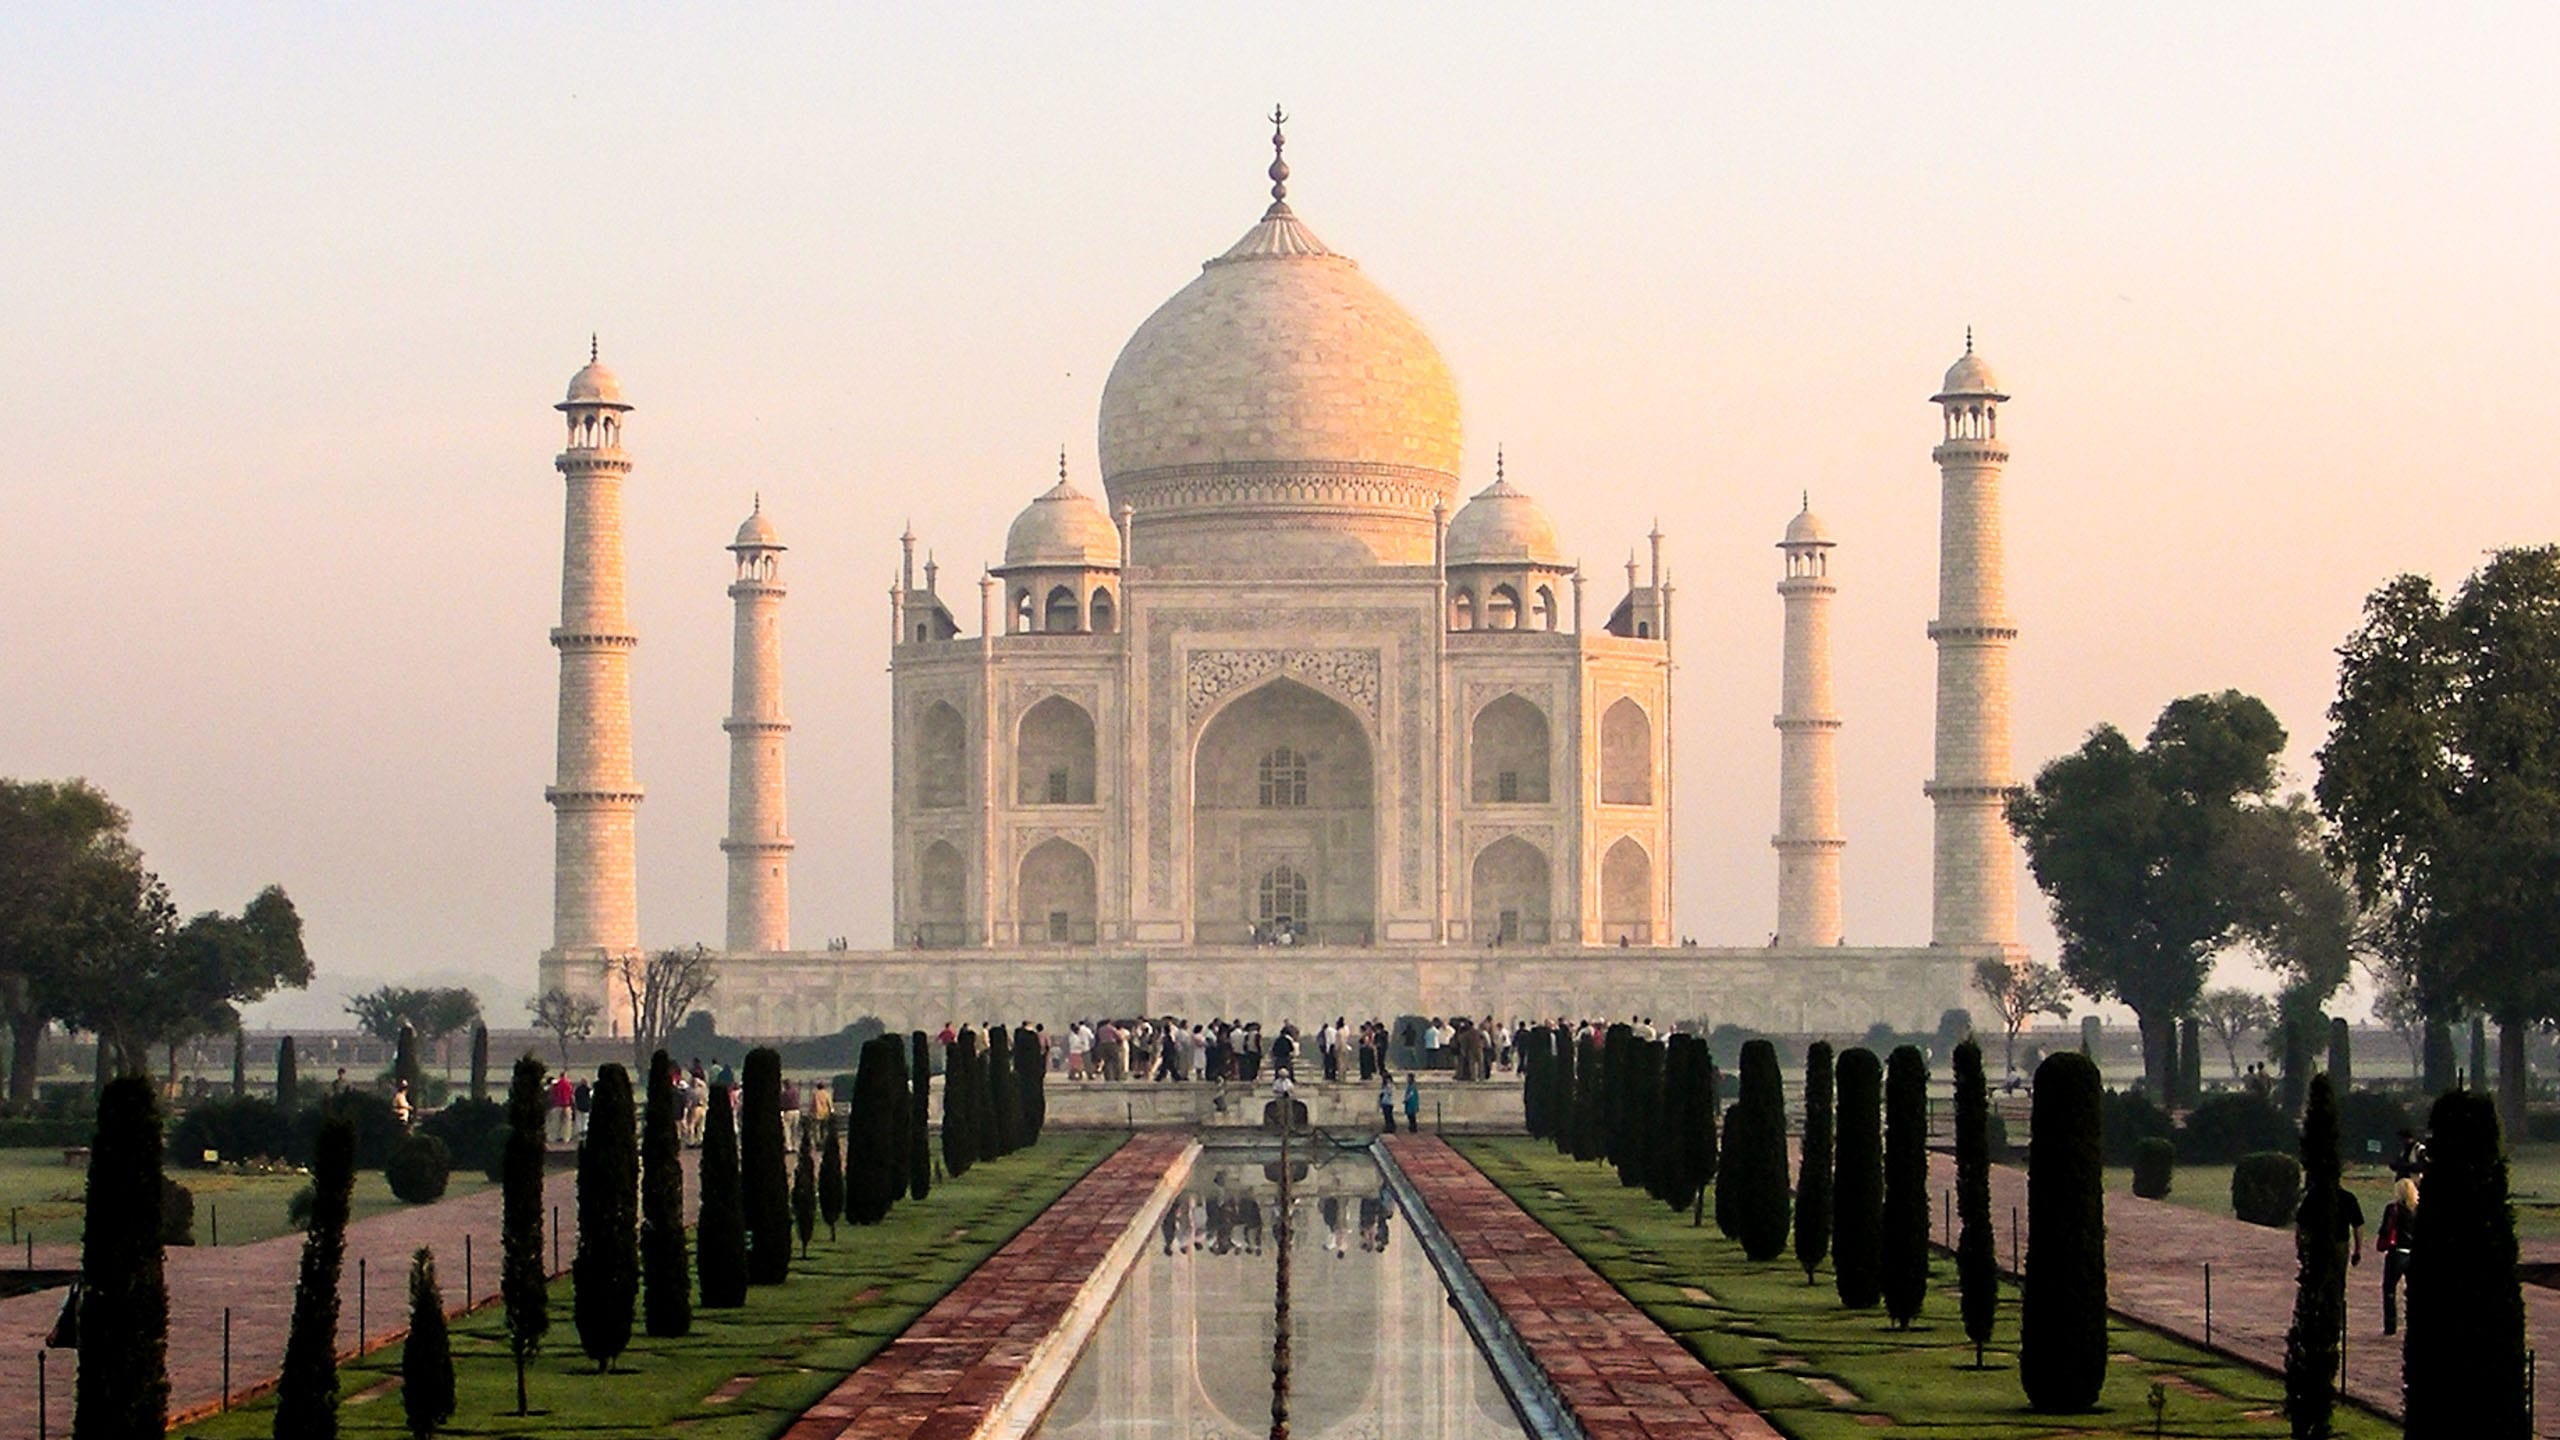 Wide view of the Taj Mahal